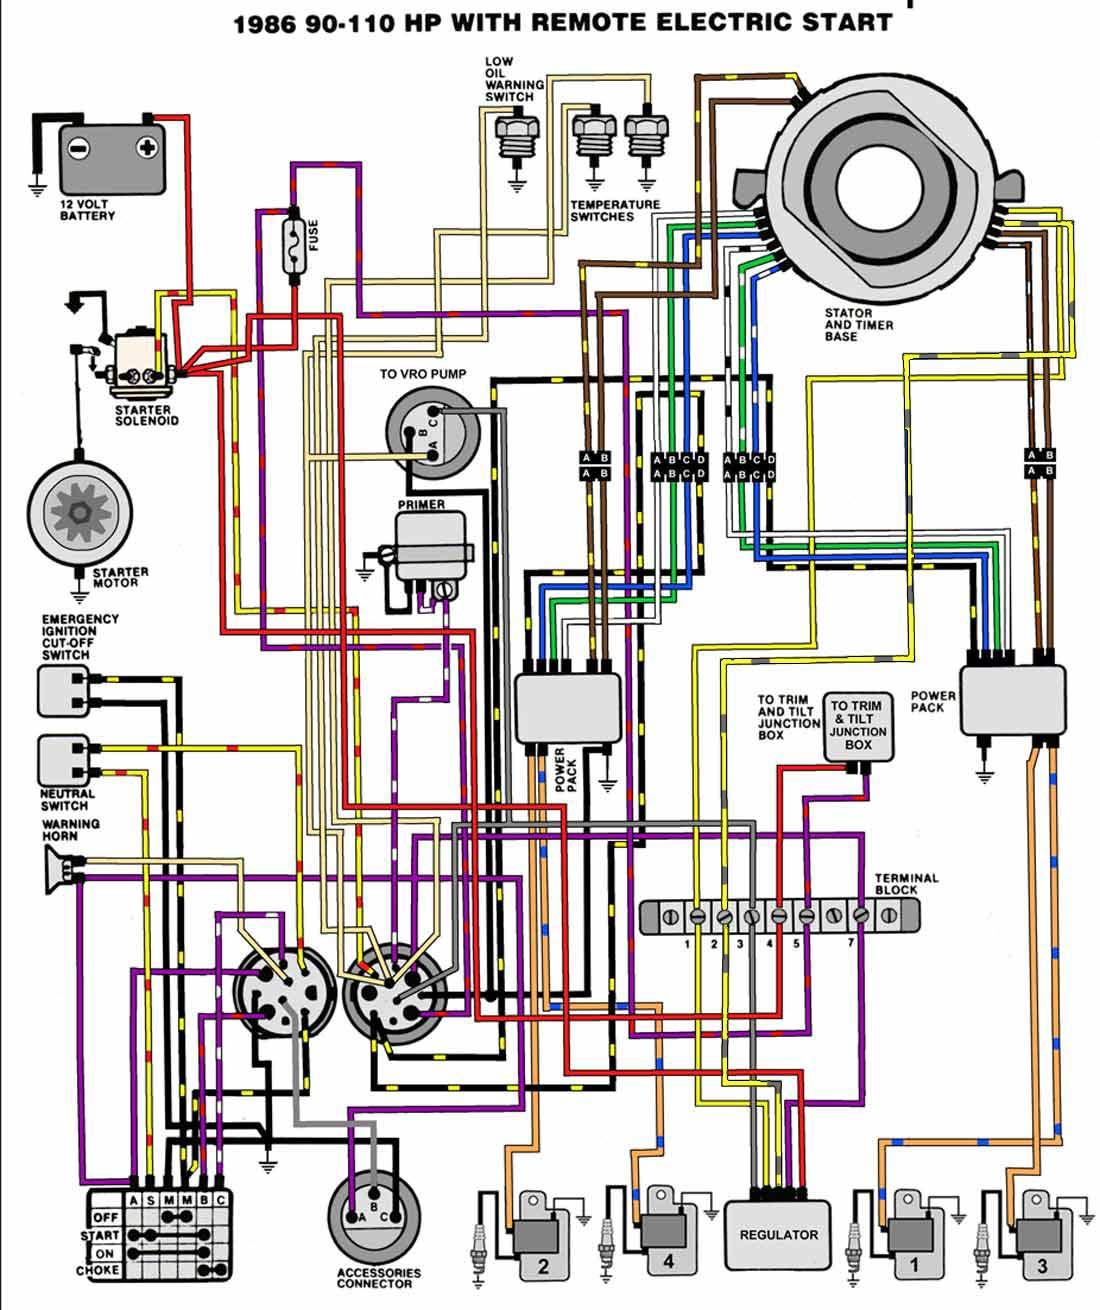 evinrude outboard motor parts diagram motorssite org rh motorssite org 200 HP Johnson Outboard Parts Johnson Outboard Looper